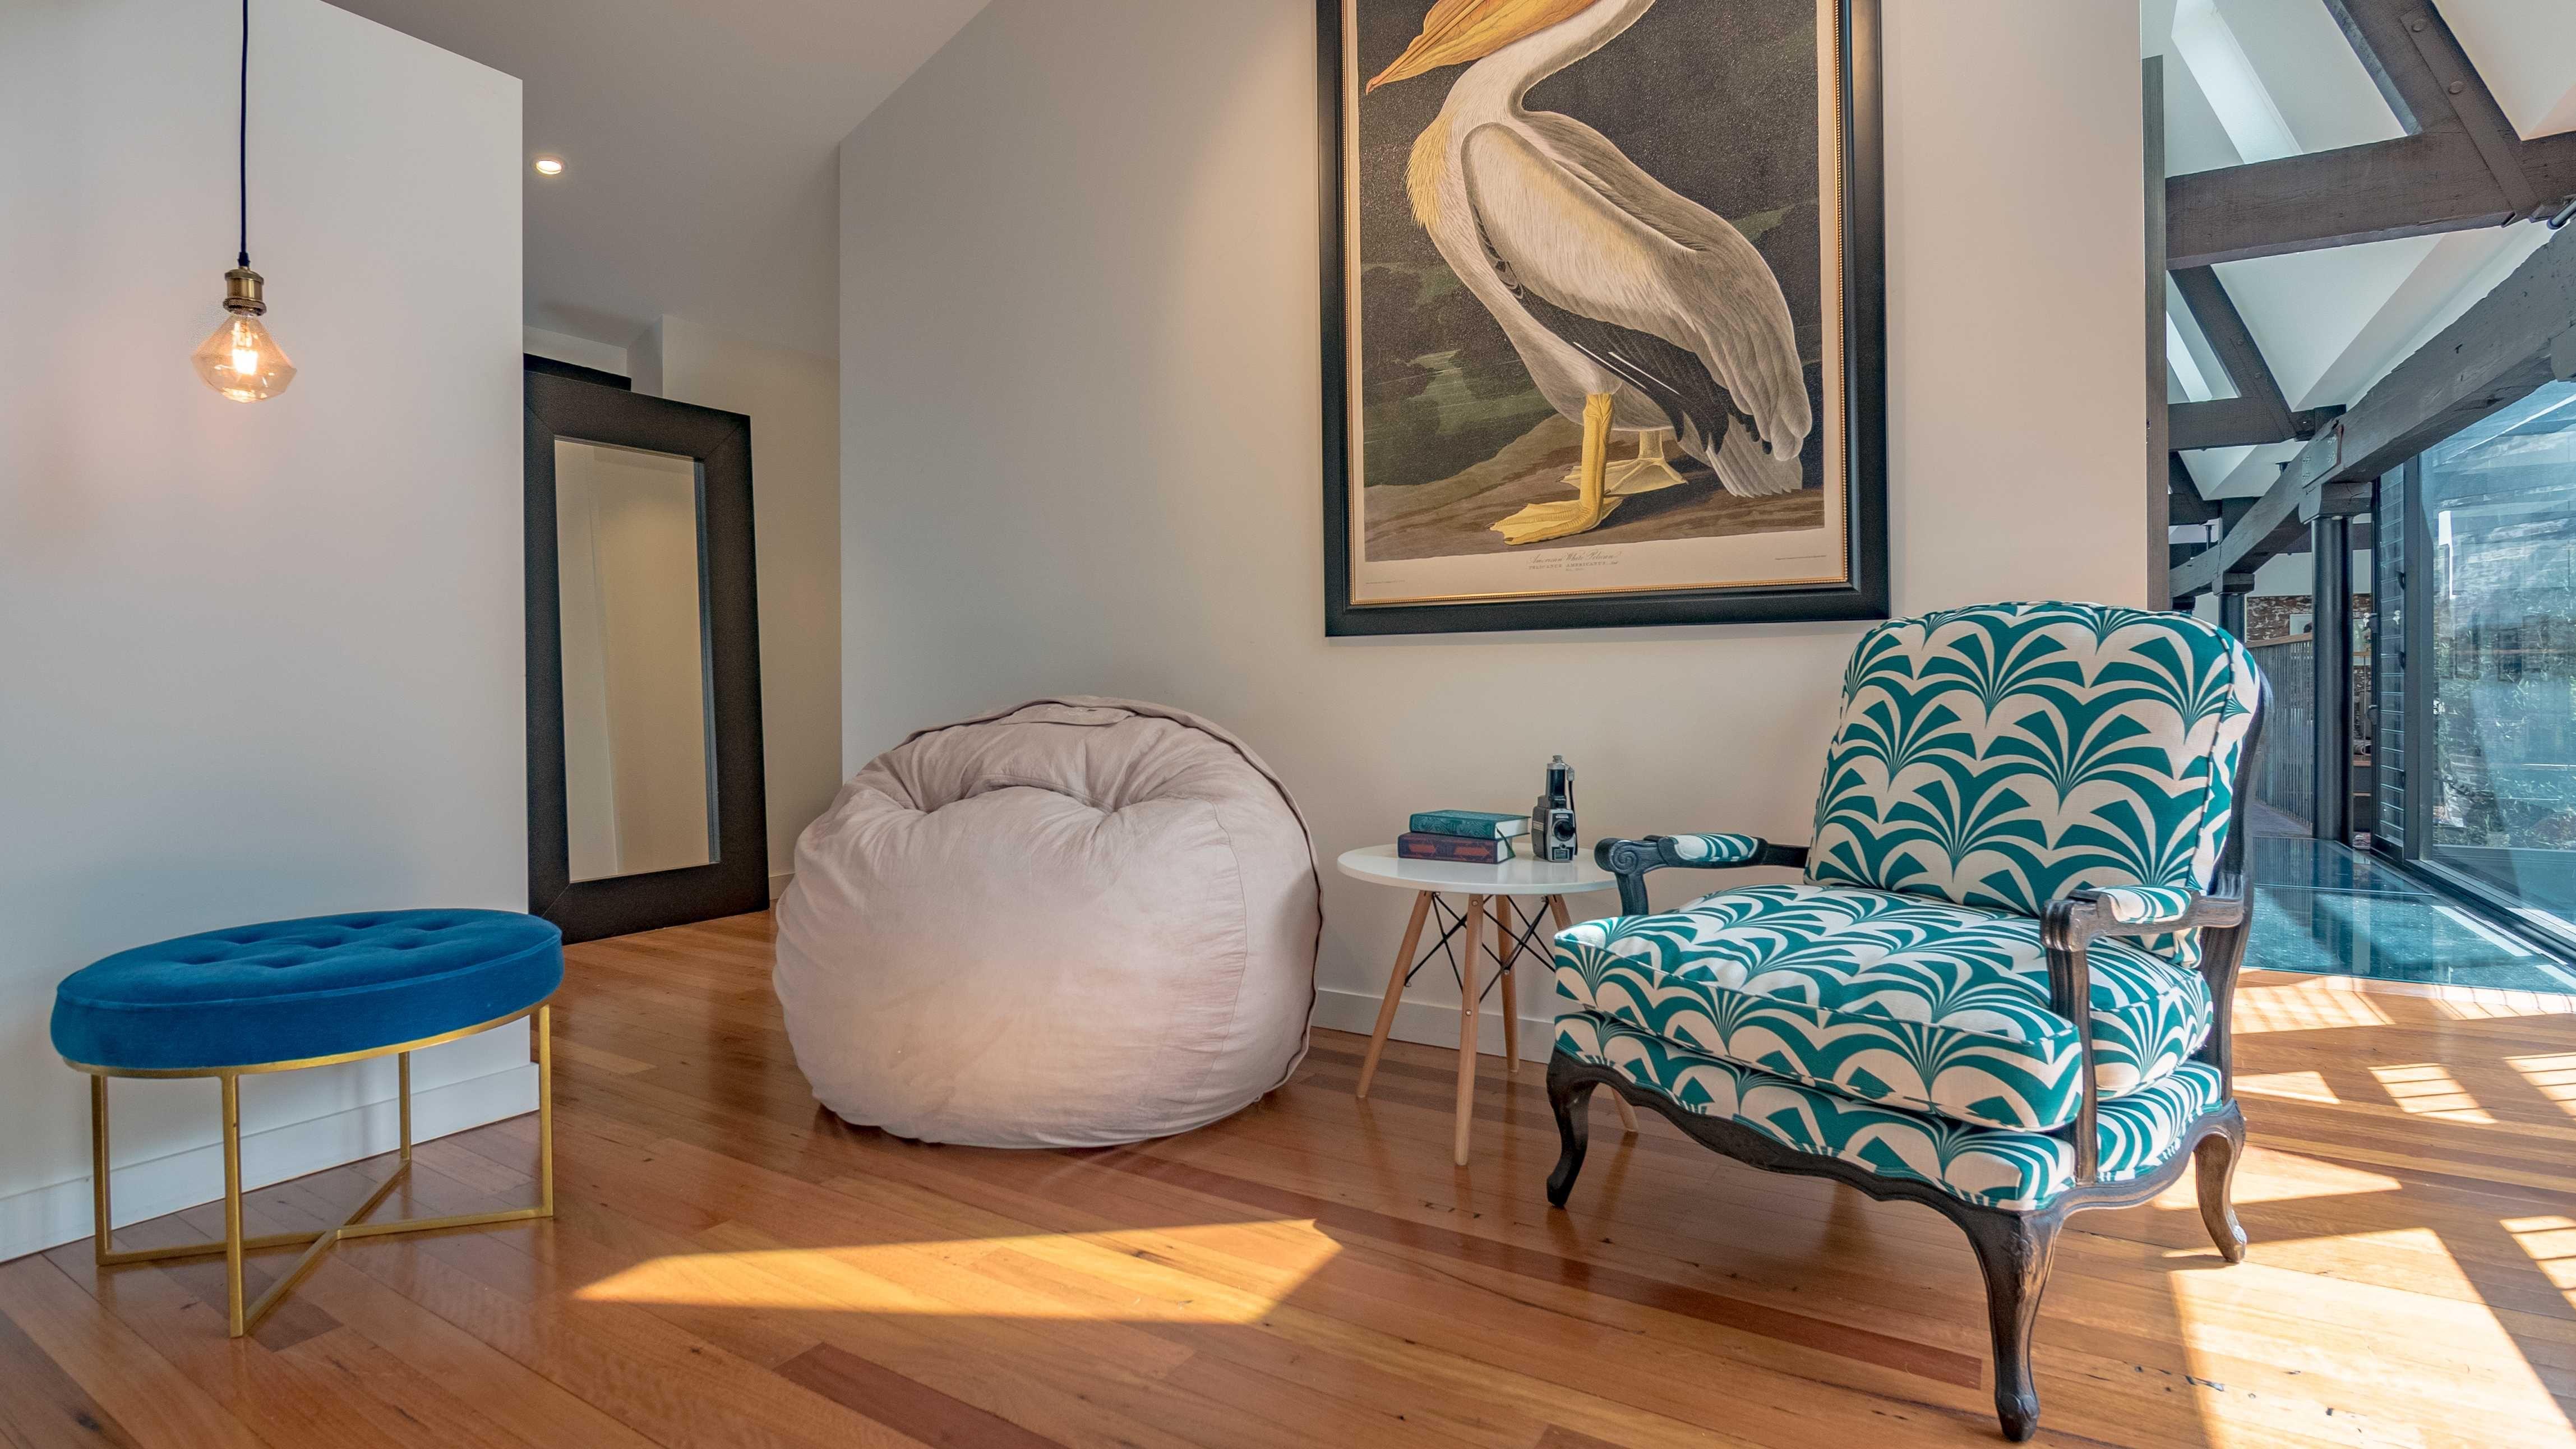 Meuse Ivory Bean bag chair, Home decor, Furniture